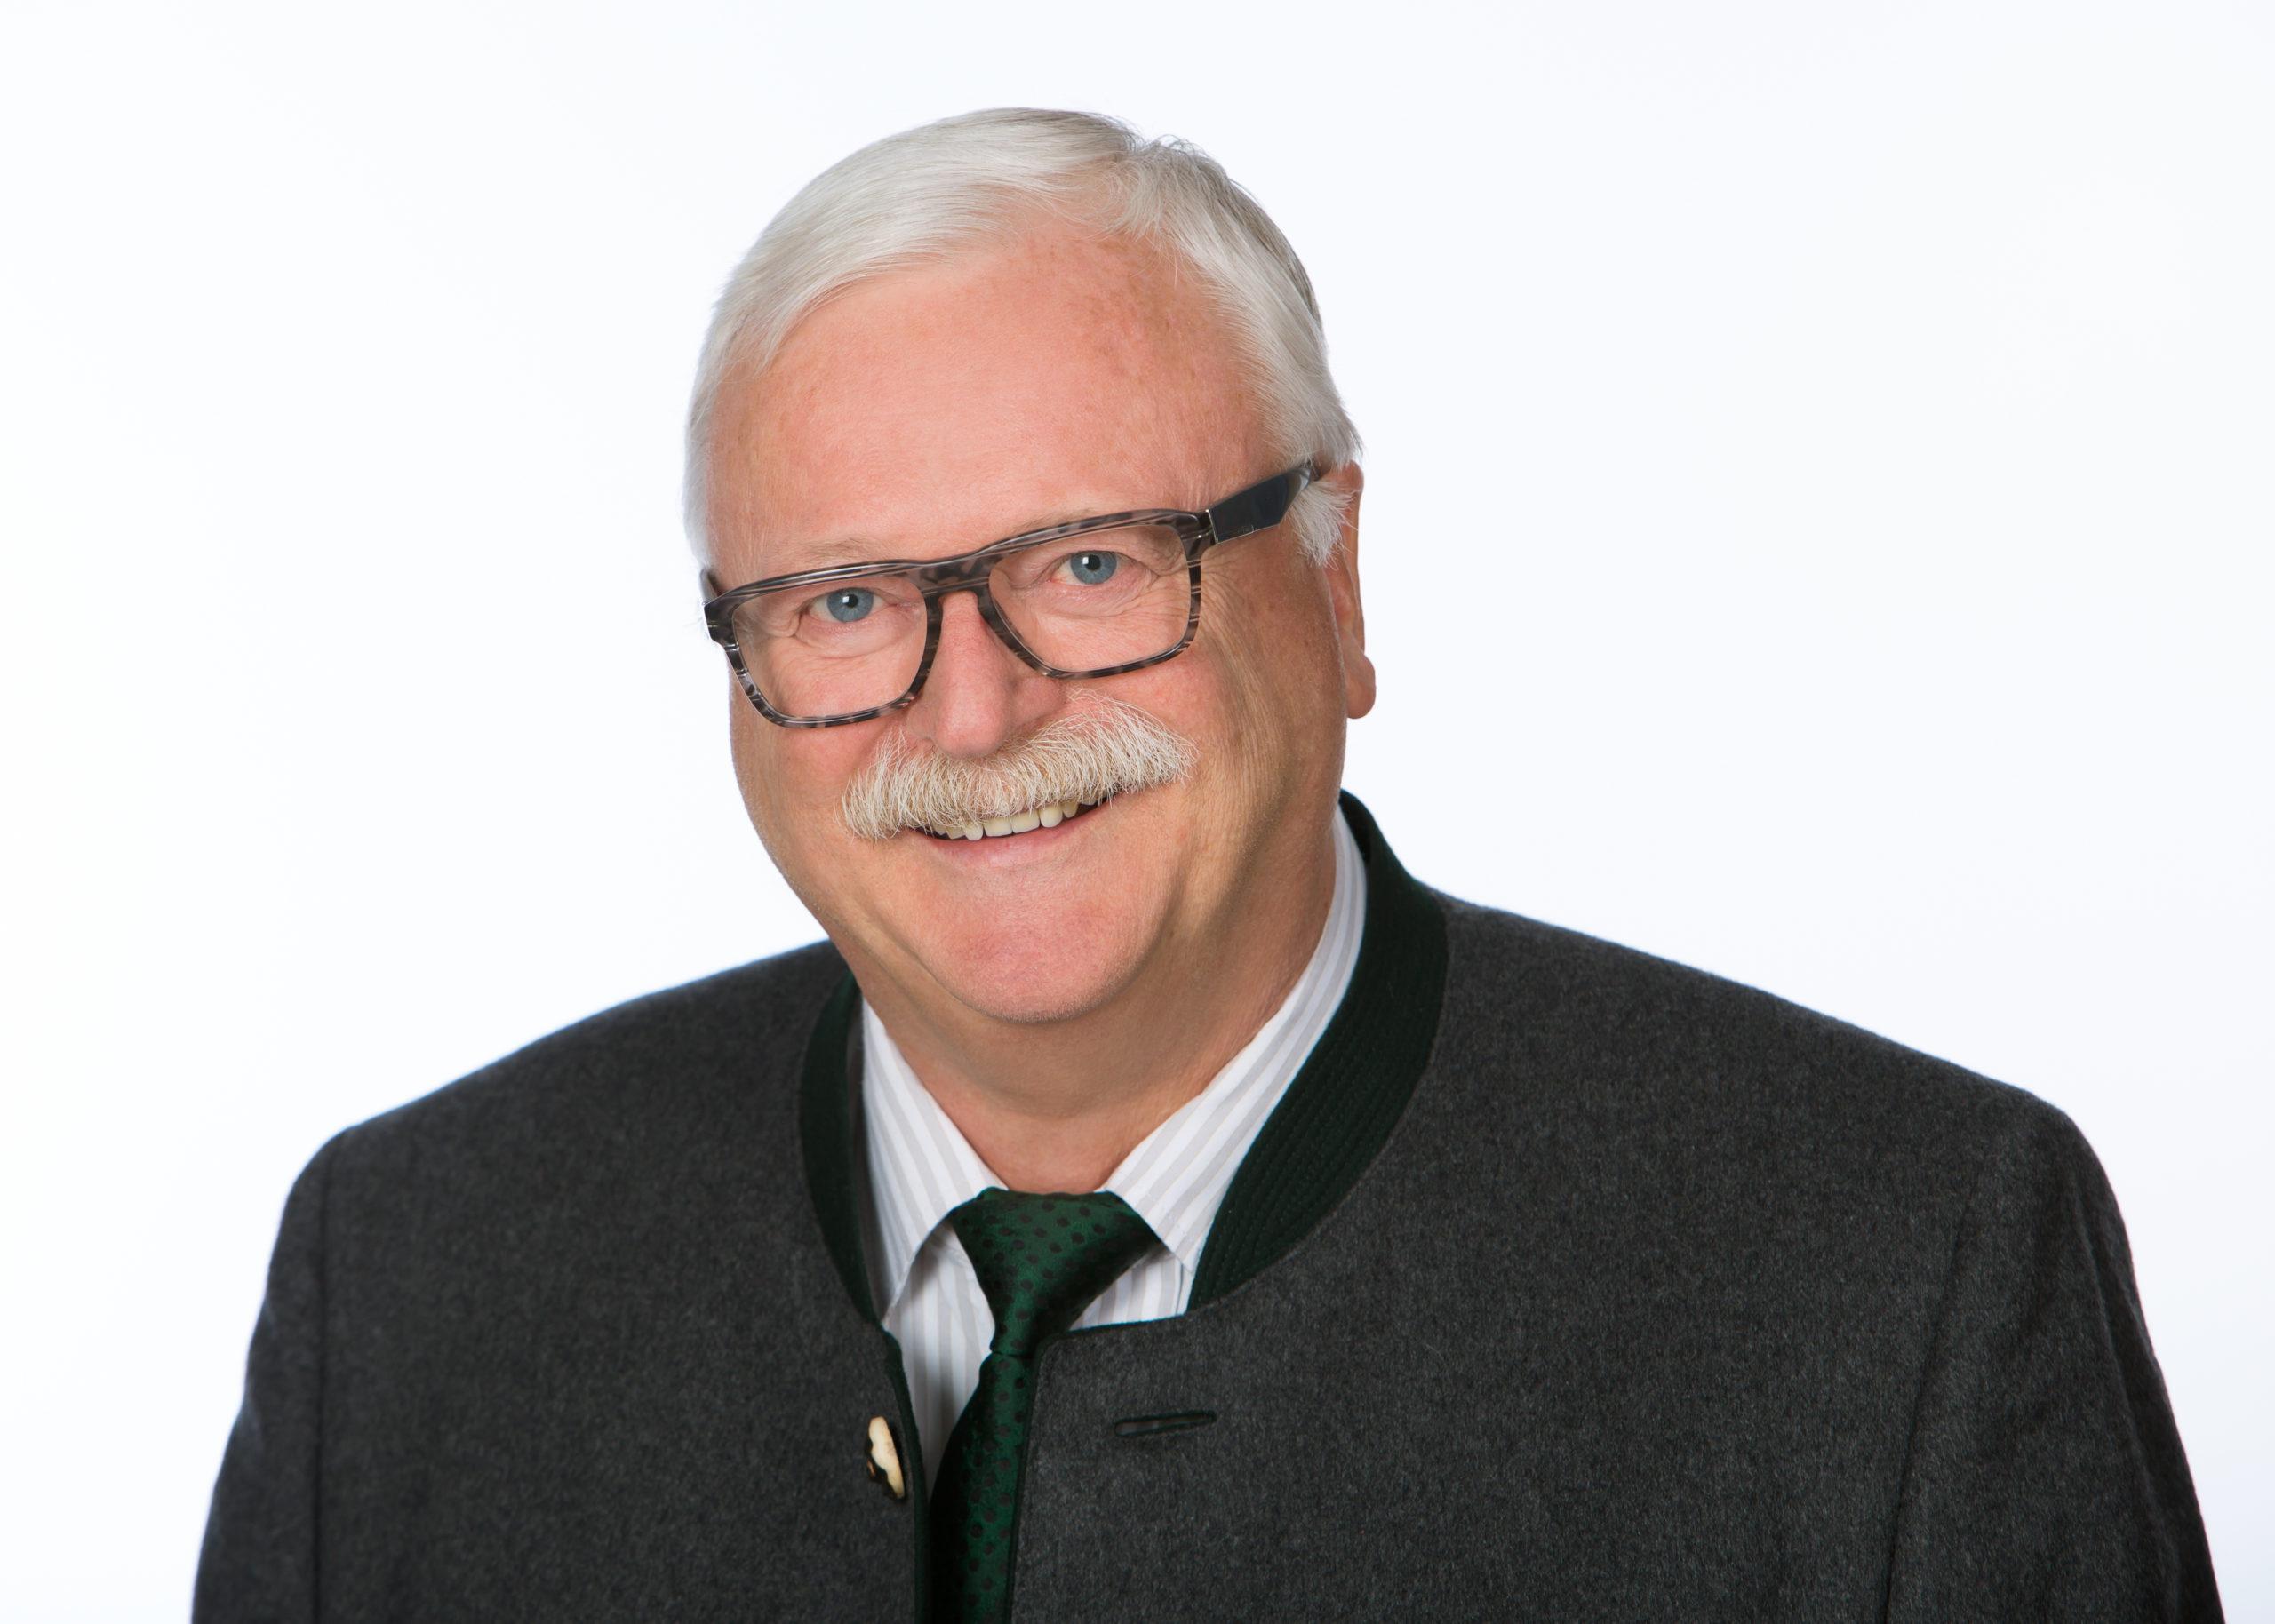 Jürgen Witt BfP